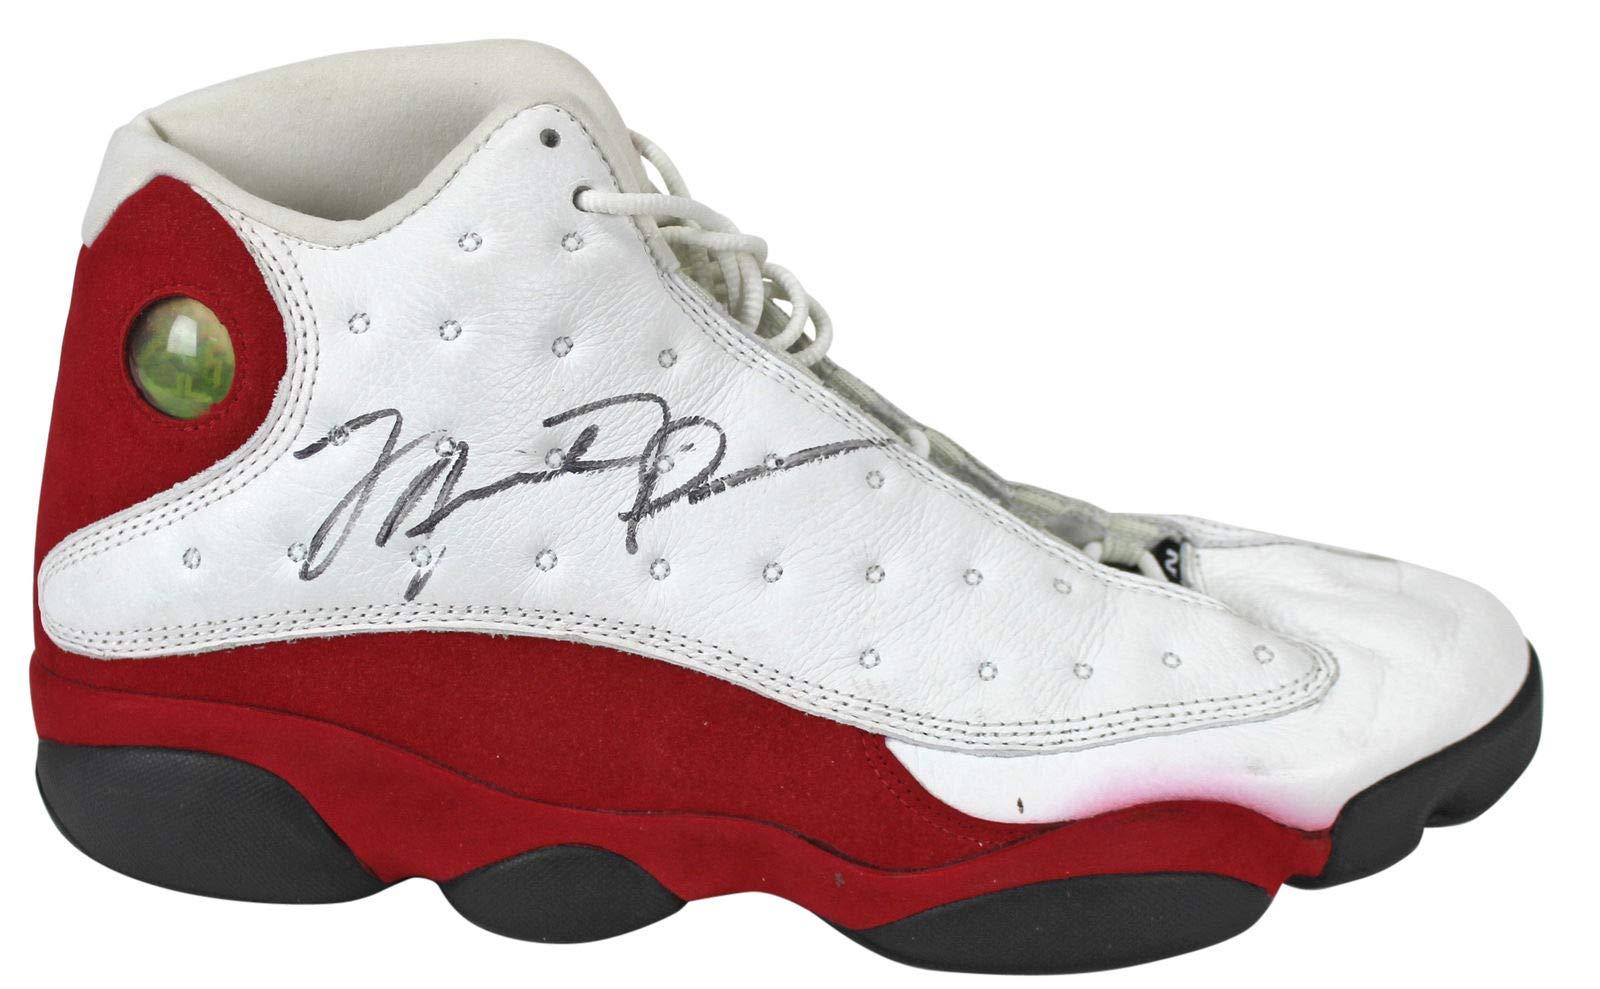 Bulls Michael Jordan Autographed Signed Game Used 4/17/1998 Nike Air Jordan Xiii Shoes JSA Authentic